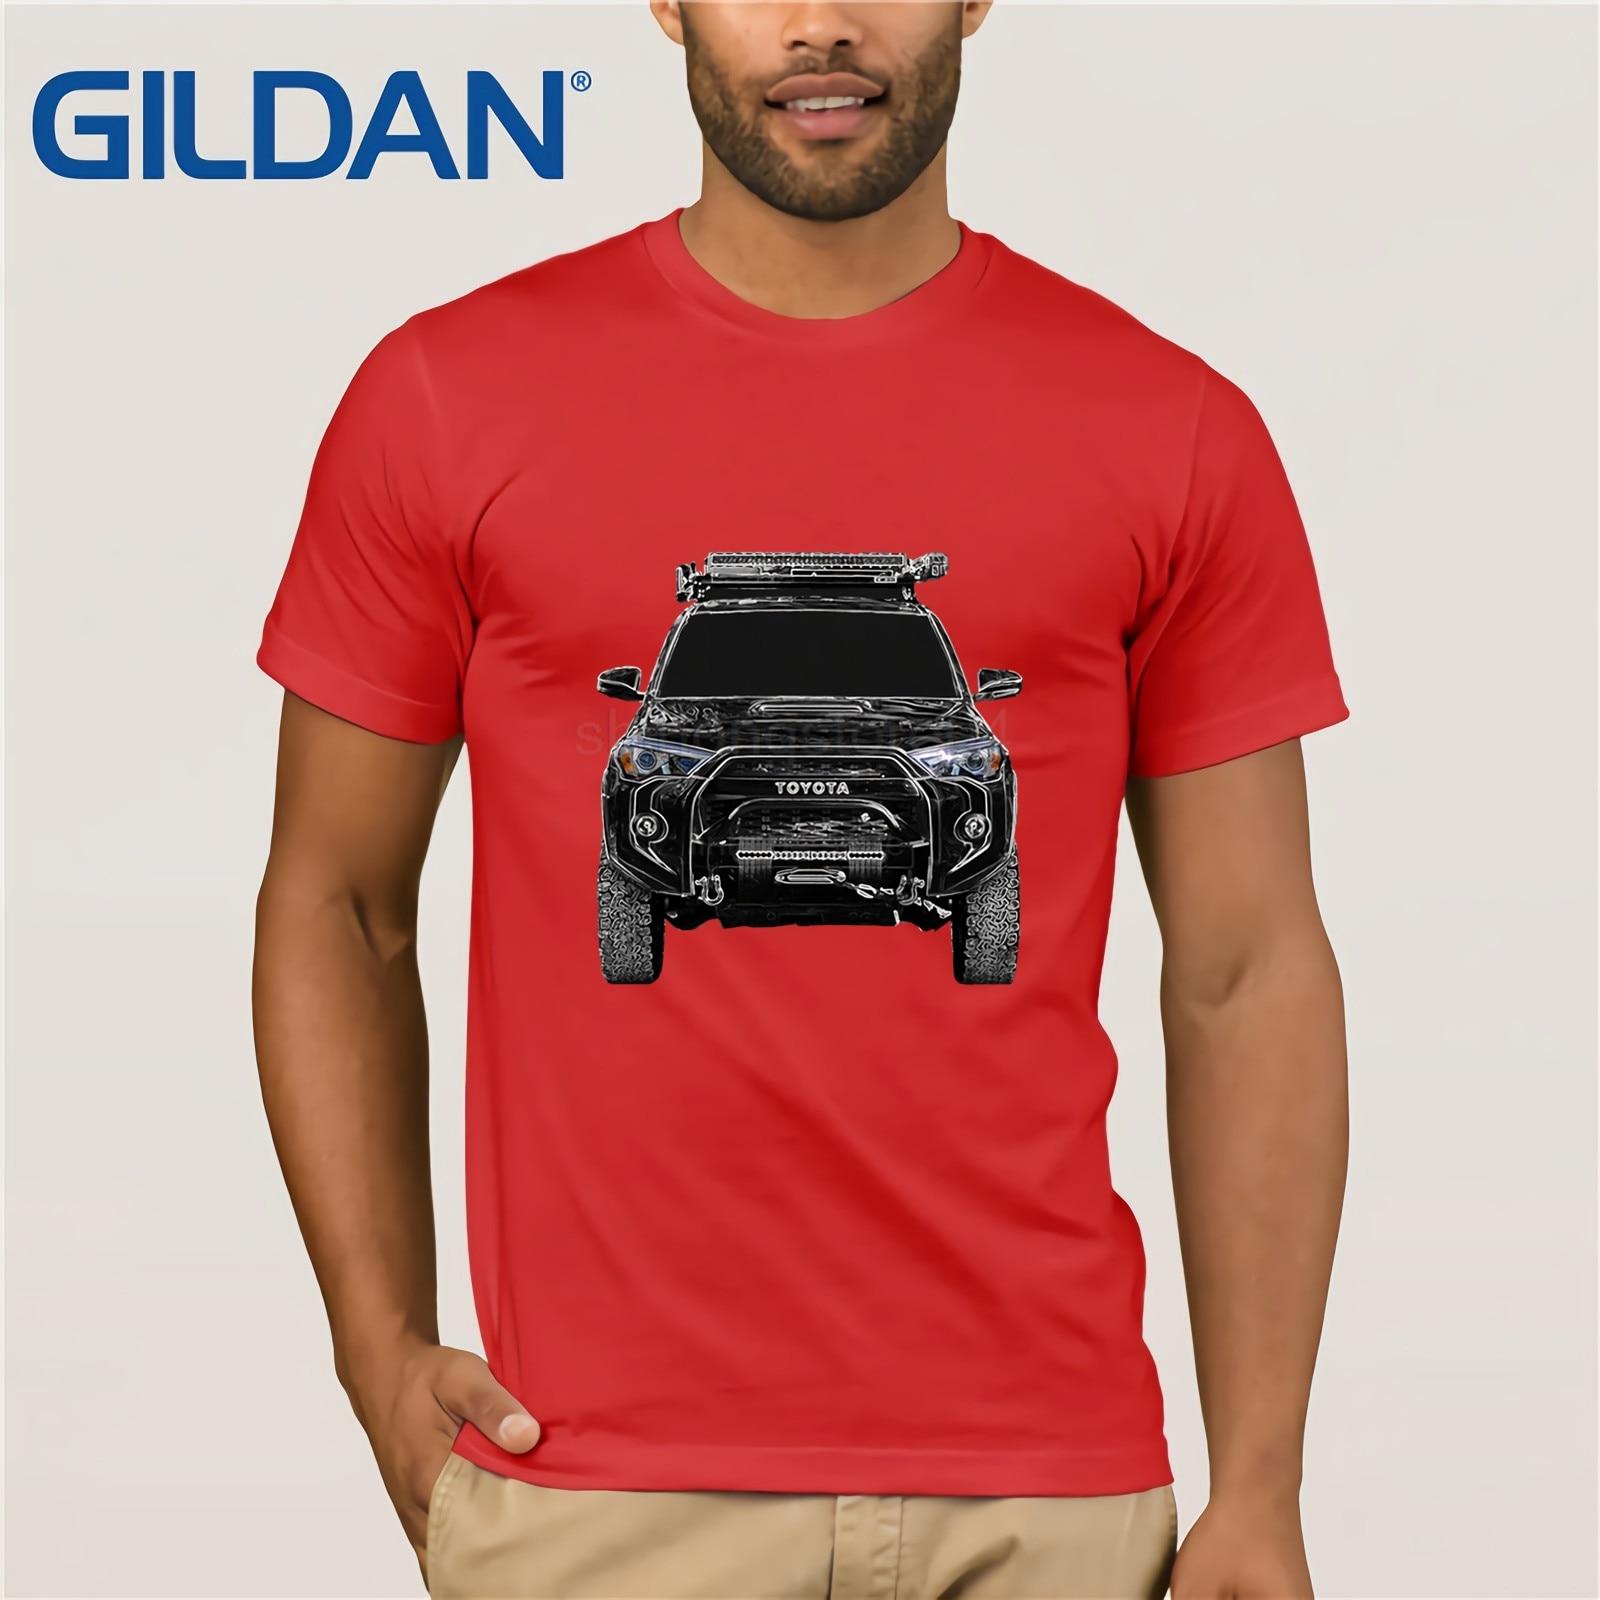 Newest 2019 Men T Shirt Fashion 4 Runner 4x4 Roof Rack Rock Slider Lift Off Road Light Winch Bumper SHIRT O Neck Tee Shirt in T Shirts from Men 39 s Clothing